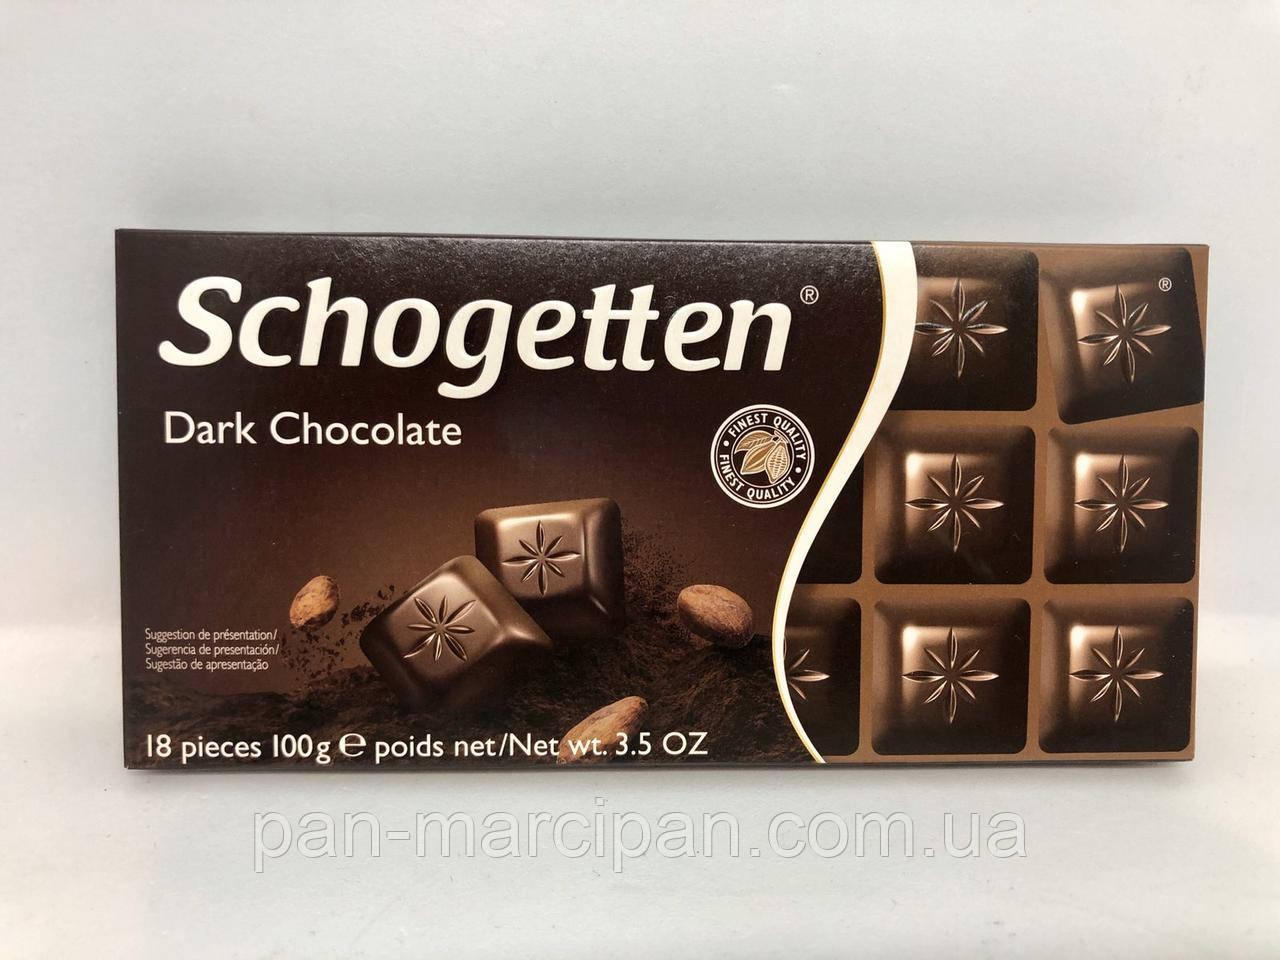 Шоколад Schogetten Dark Chocolate 100 г